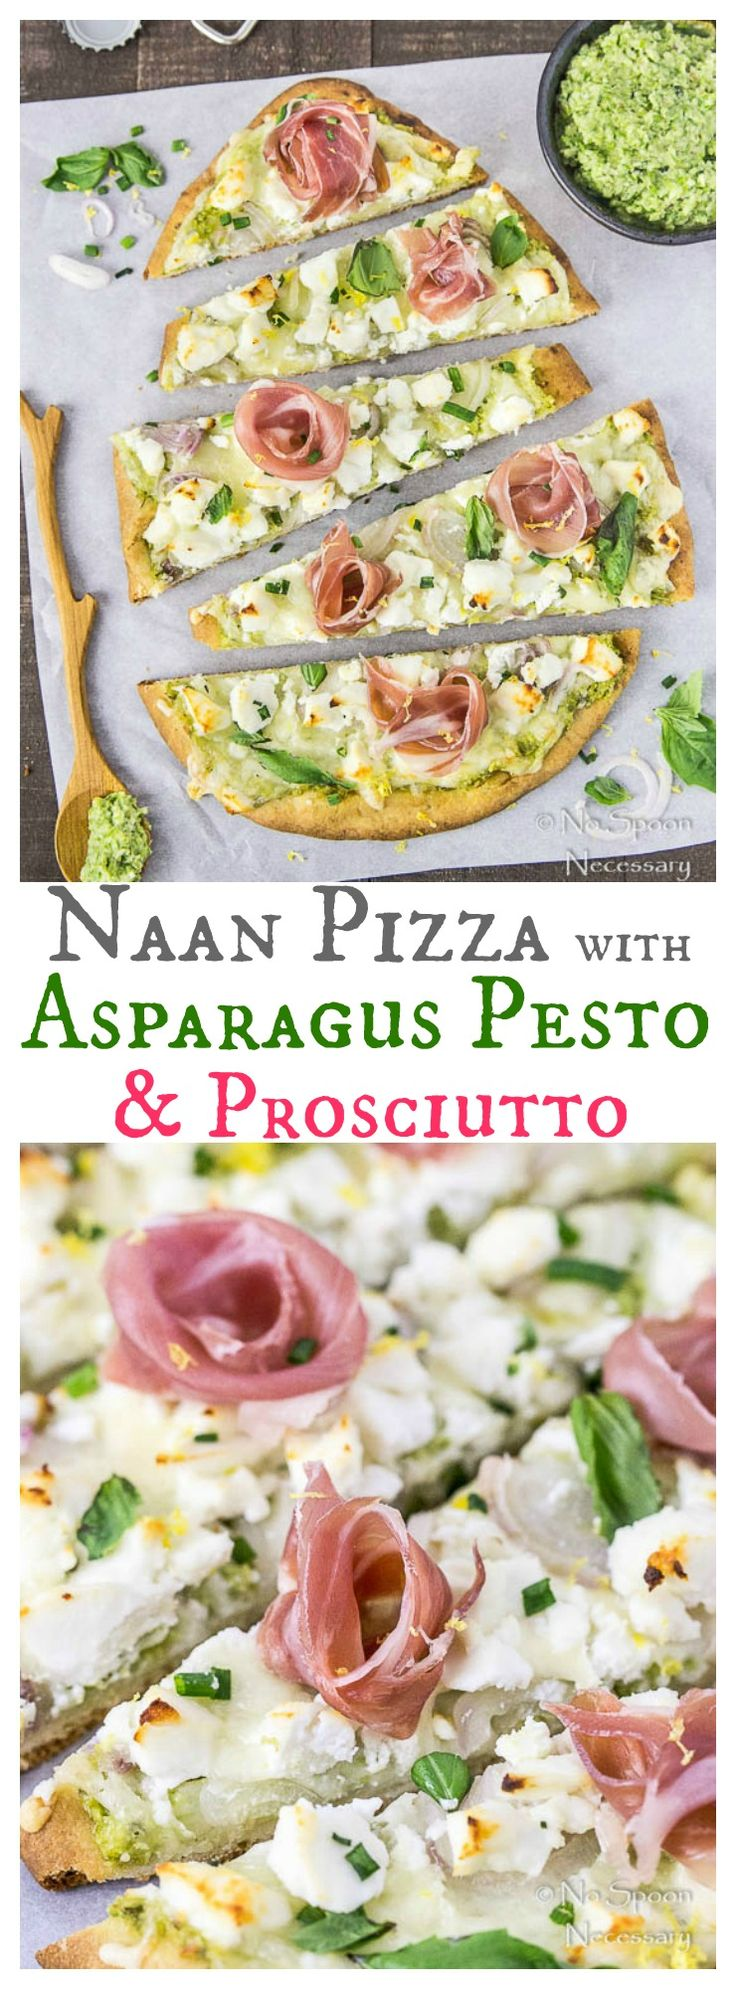 Naan Pizza with Asparagus Pesto, Prosciutto, Goat Cheese & Fontina